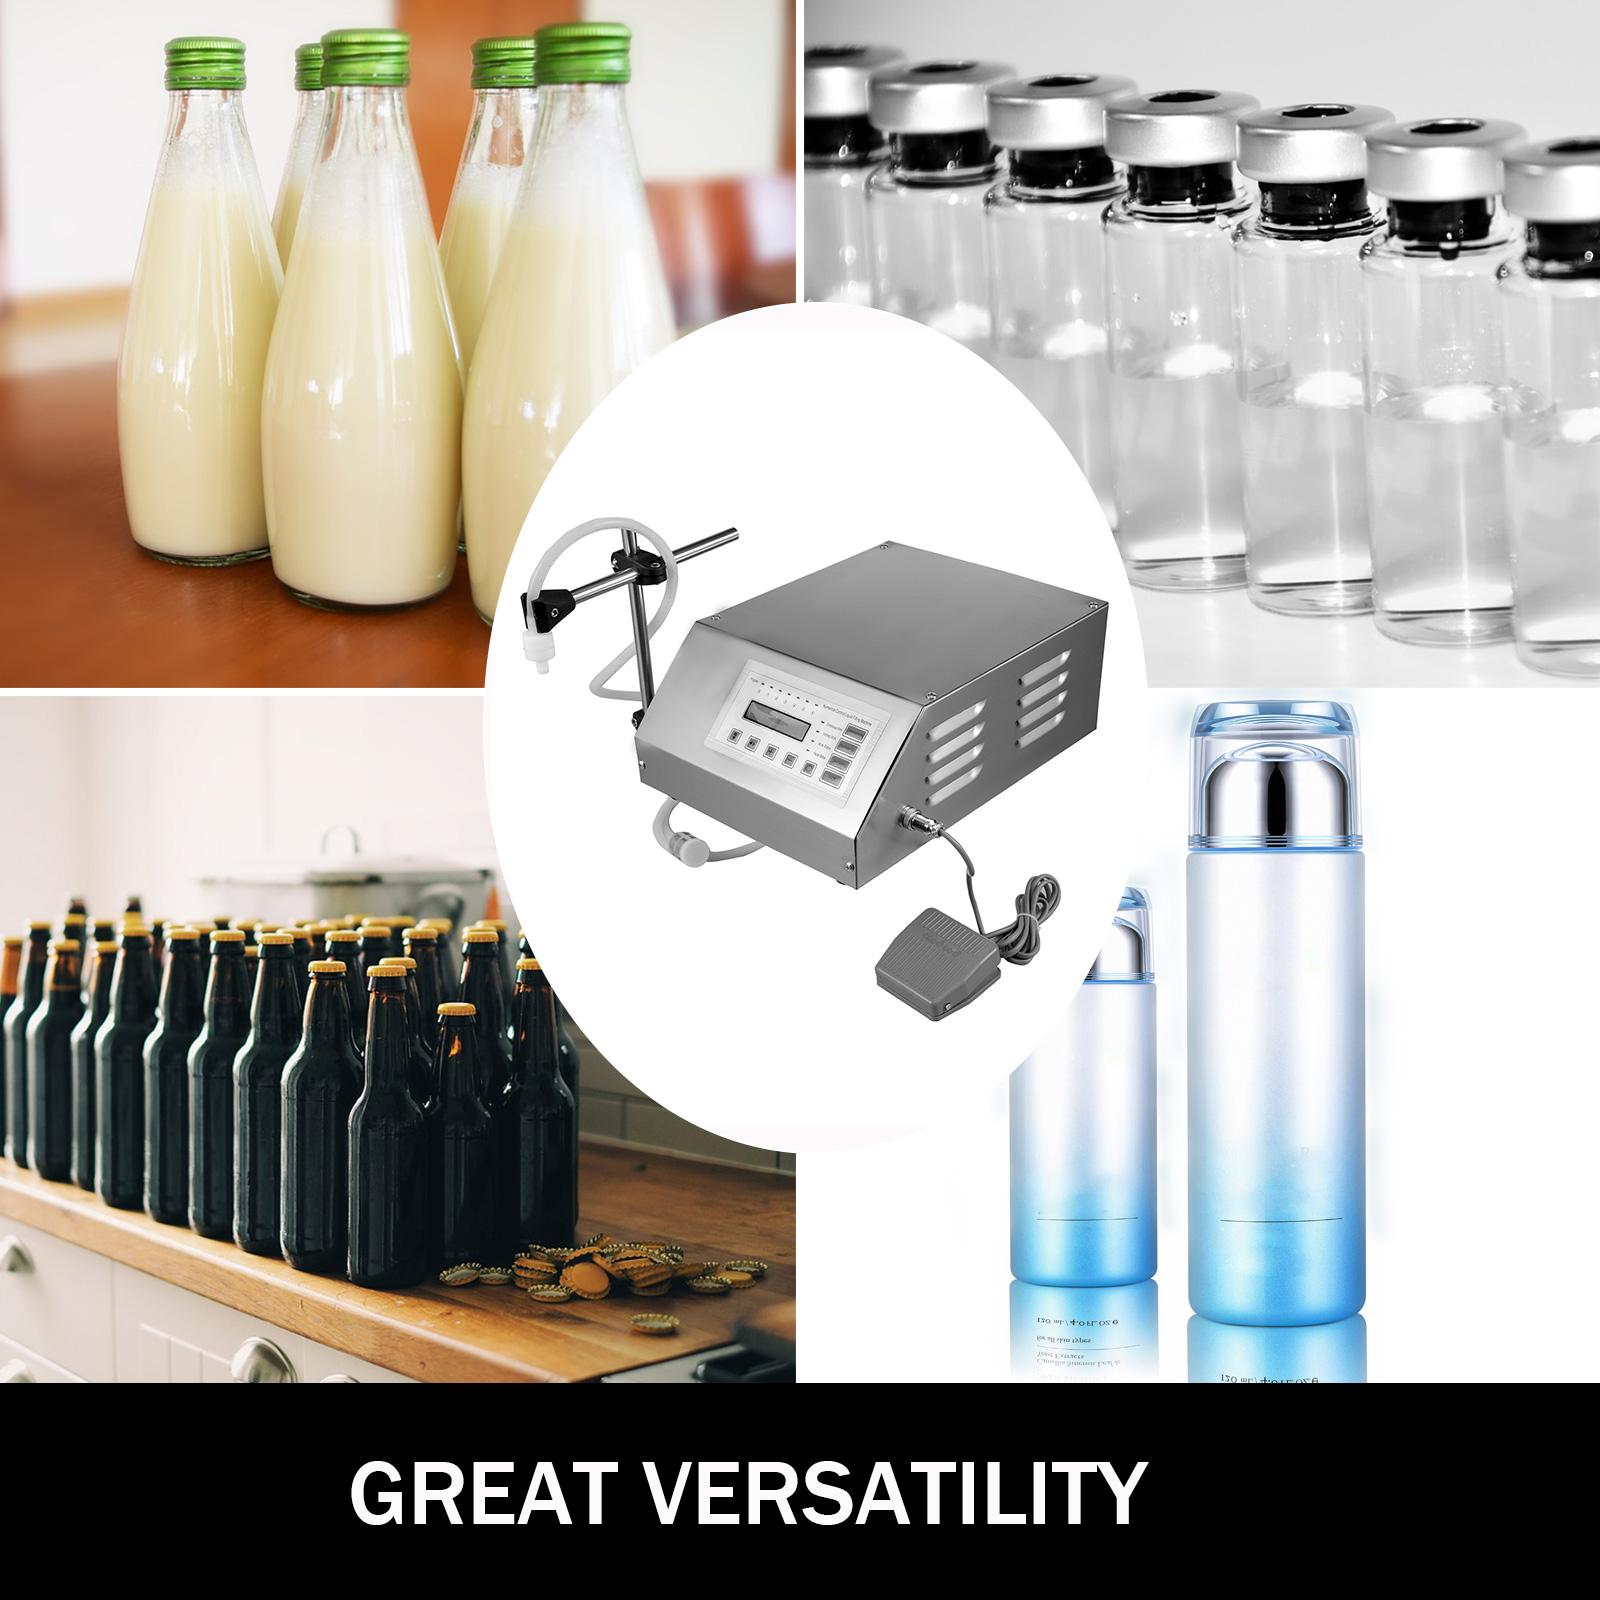 Liquid-Filling-Machine-Filler-Remplissage-2-3500ML-50-500ML-INDUSTRY-SUPPLY miniature 31